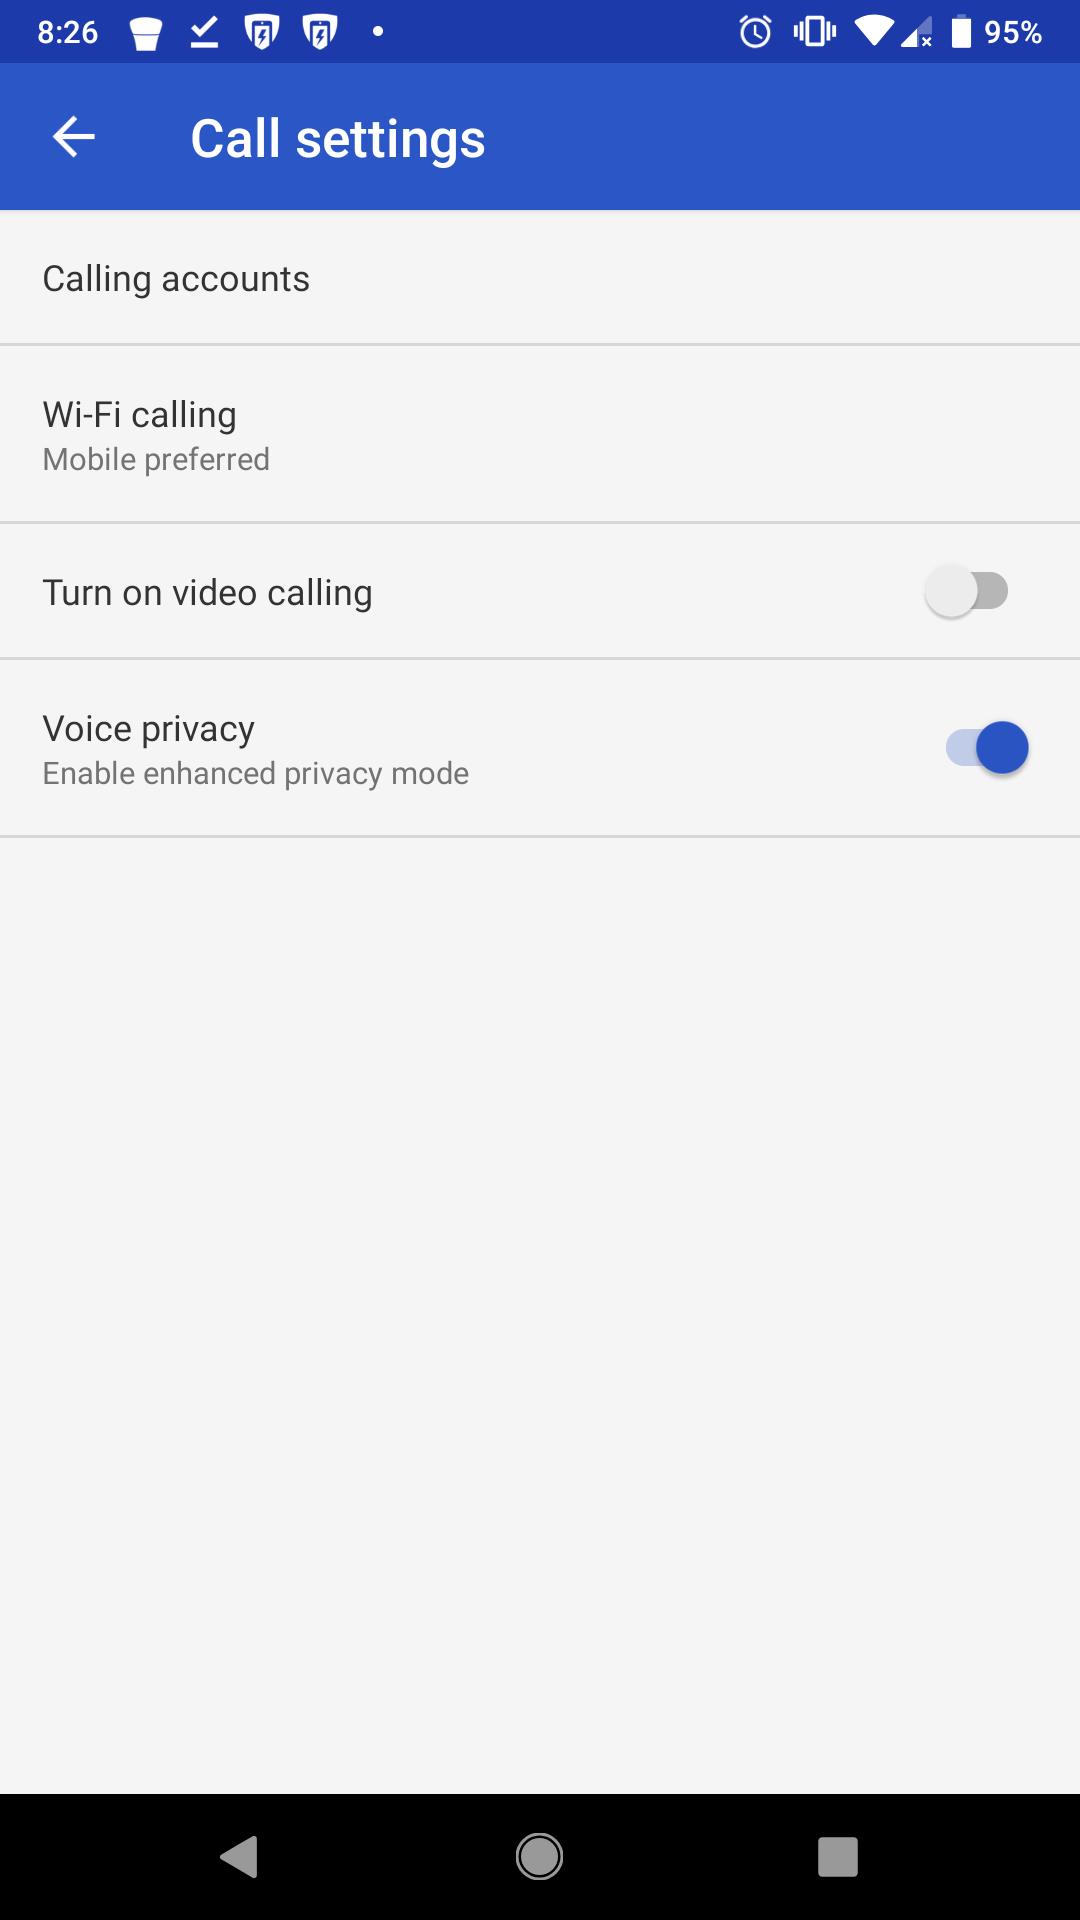 How do I force wifi preferred for wifi calling? - Verizon